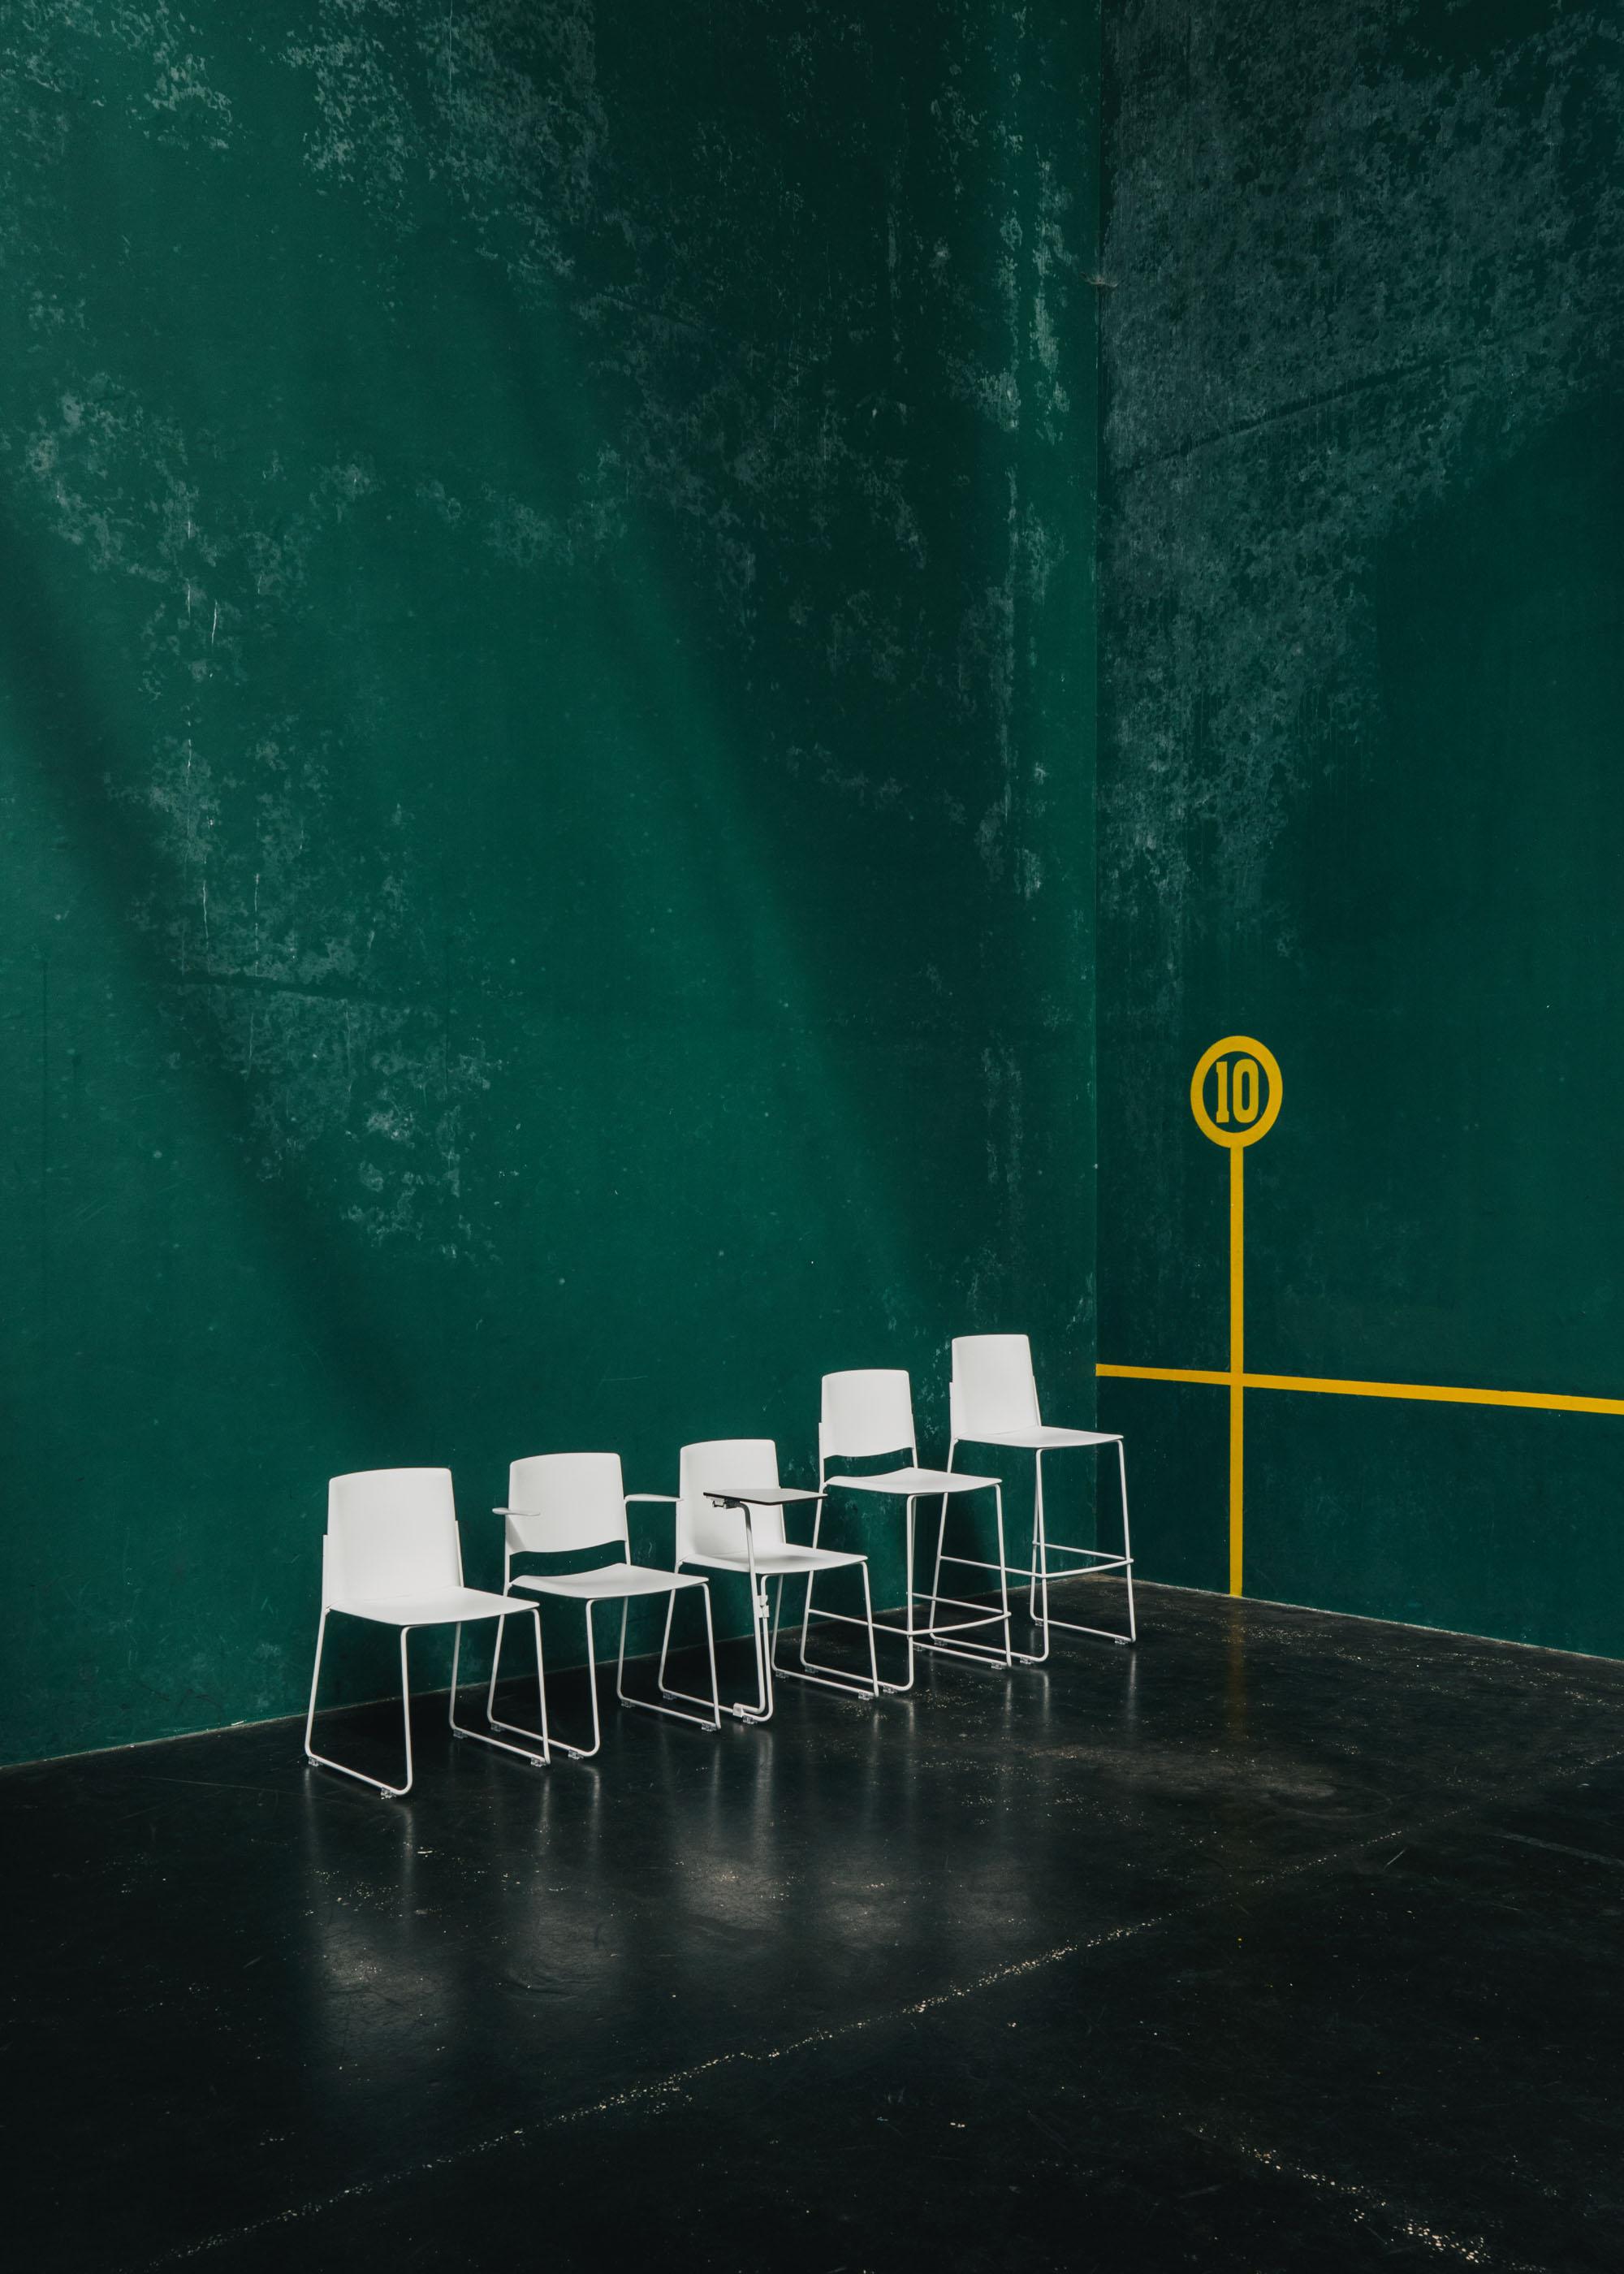 #furniture #enea #design #clase #basque #chairs #fronton #green